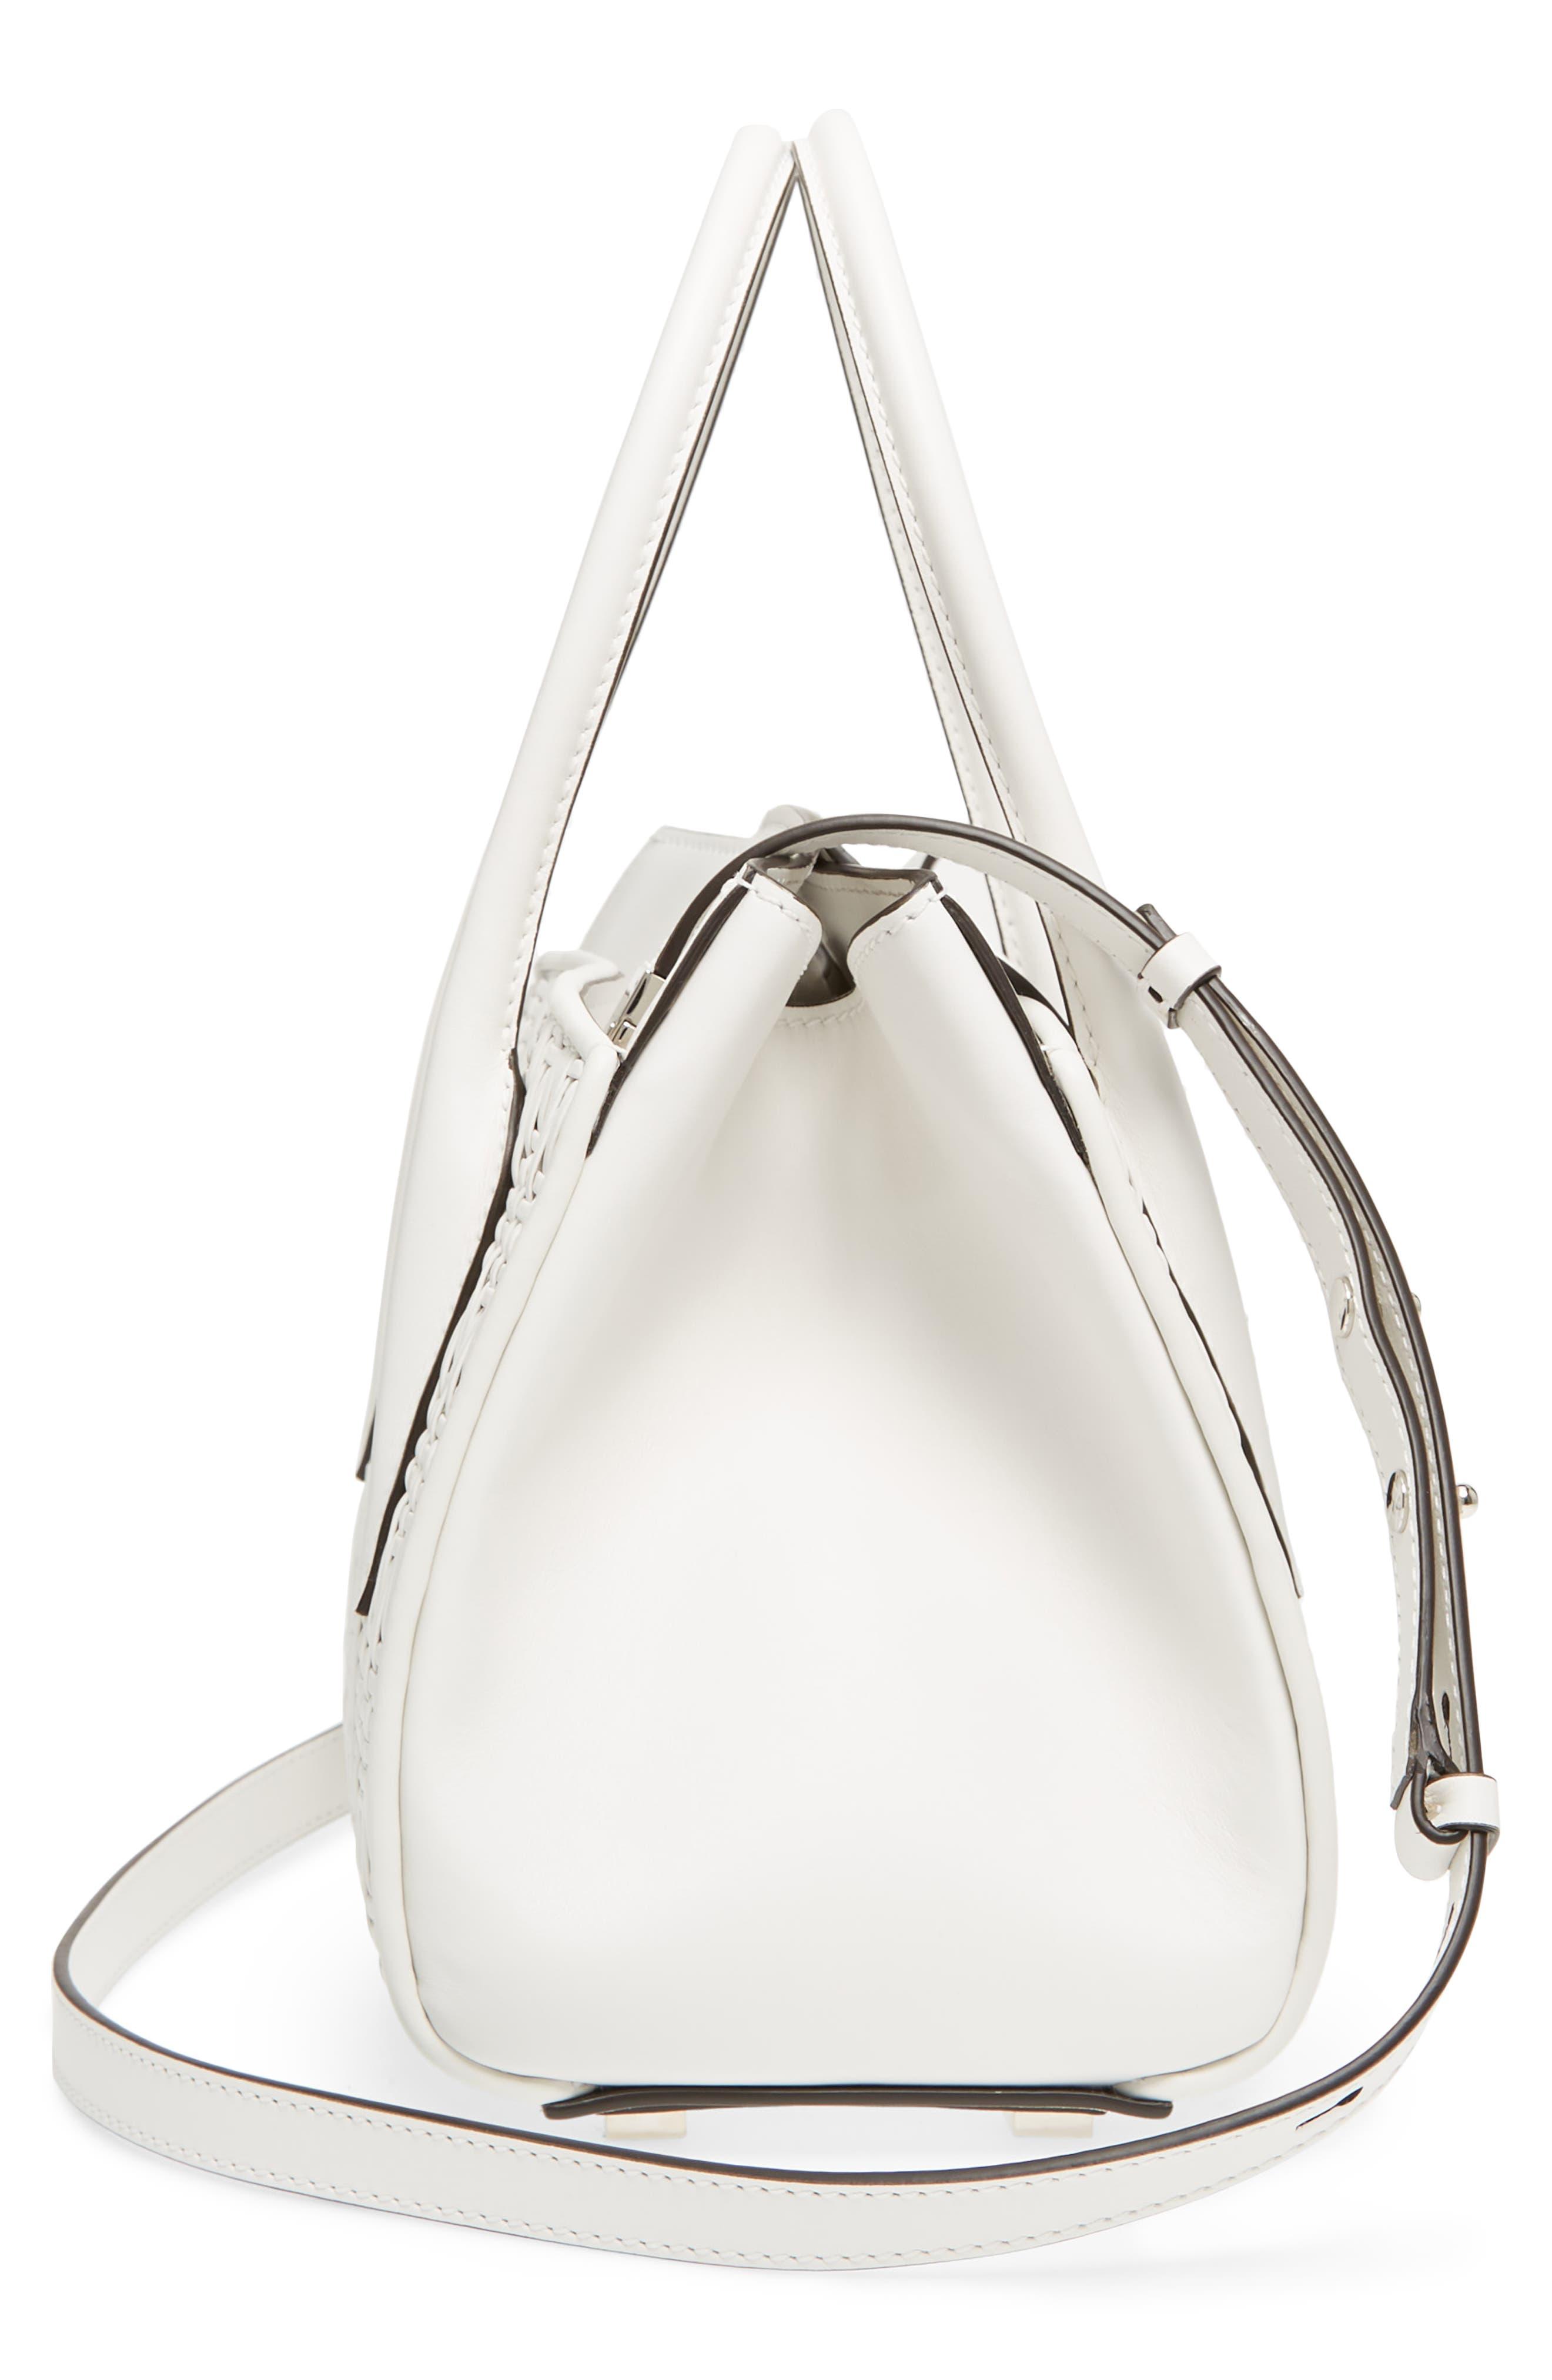 Medium Bancroft Leather Satchel,                             Alternate thumbnail 5, color,                             Optic White